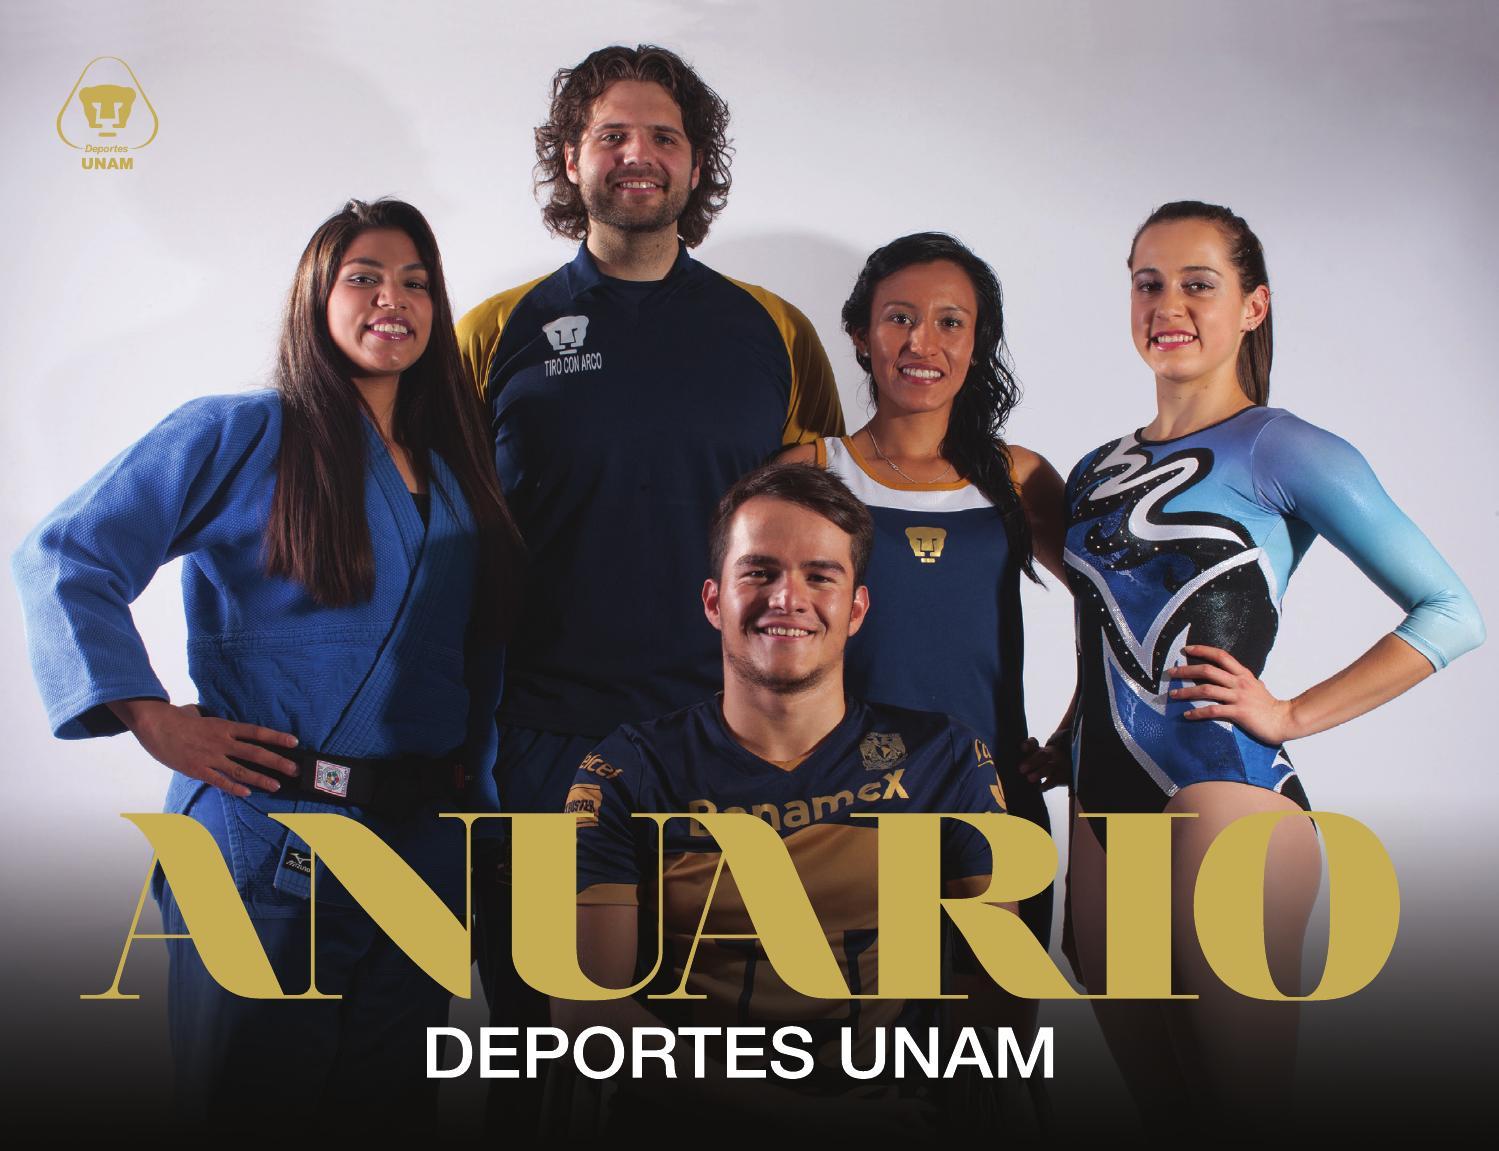 Anuario Deporte 2014 by Adriana Lima - issuu 13341716adf3f